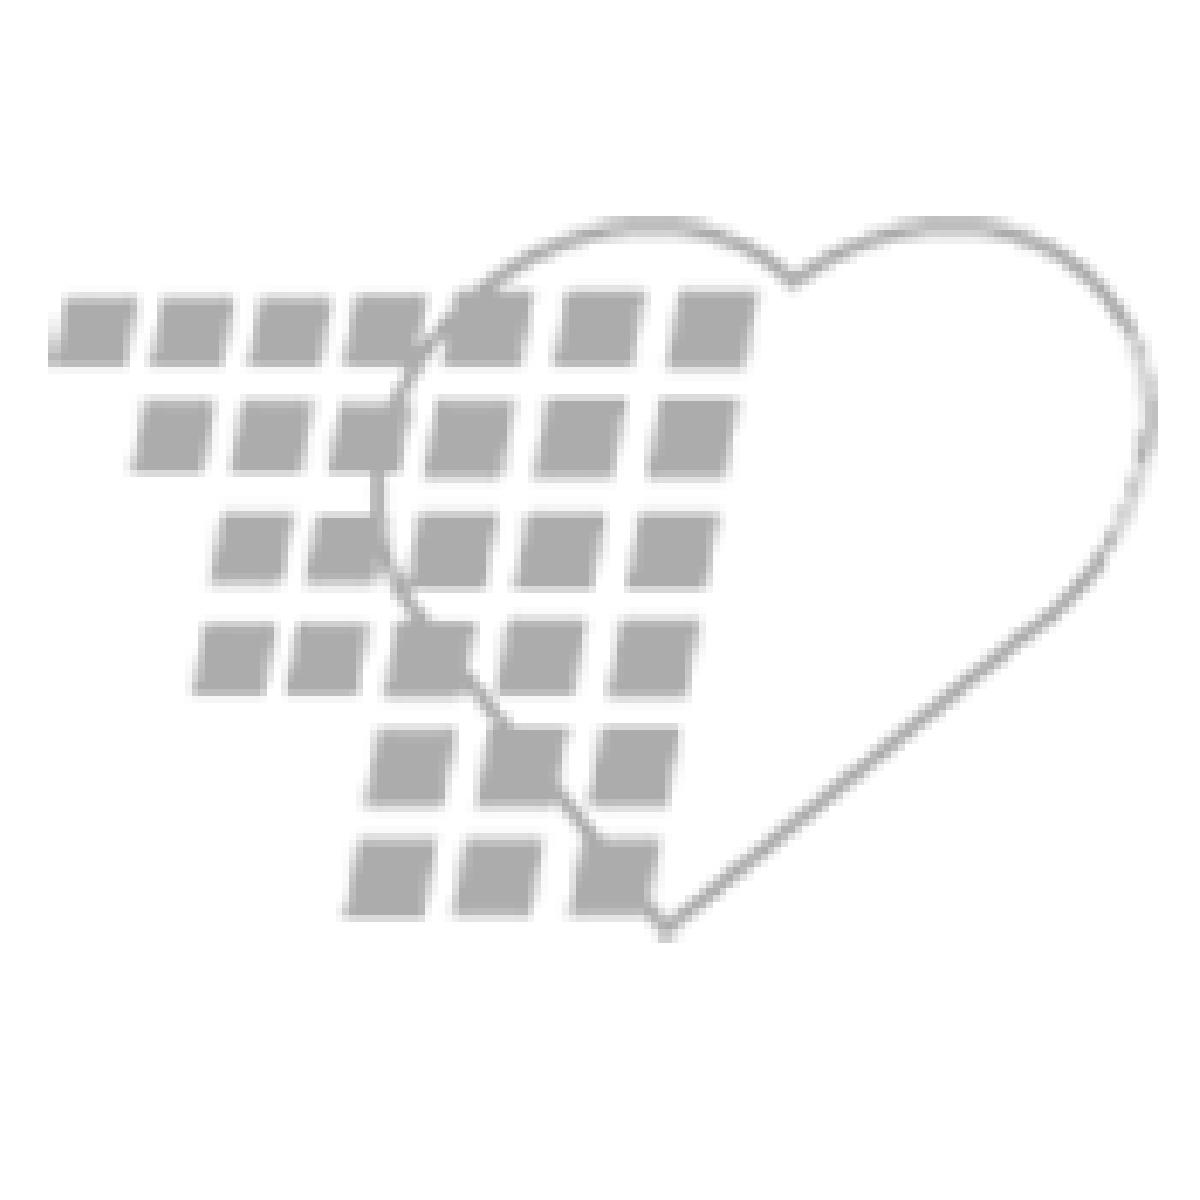 "06-26-2535 - B.Braun Introcan Safety IV Catheter - 20G x 1.25"" Straight"